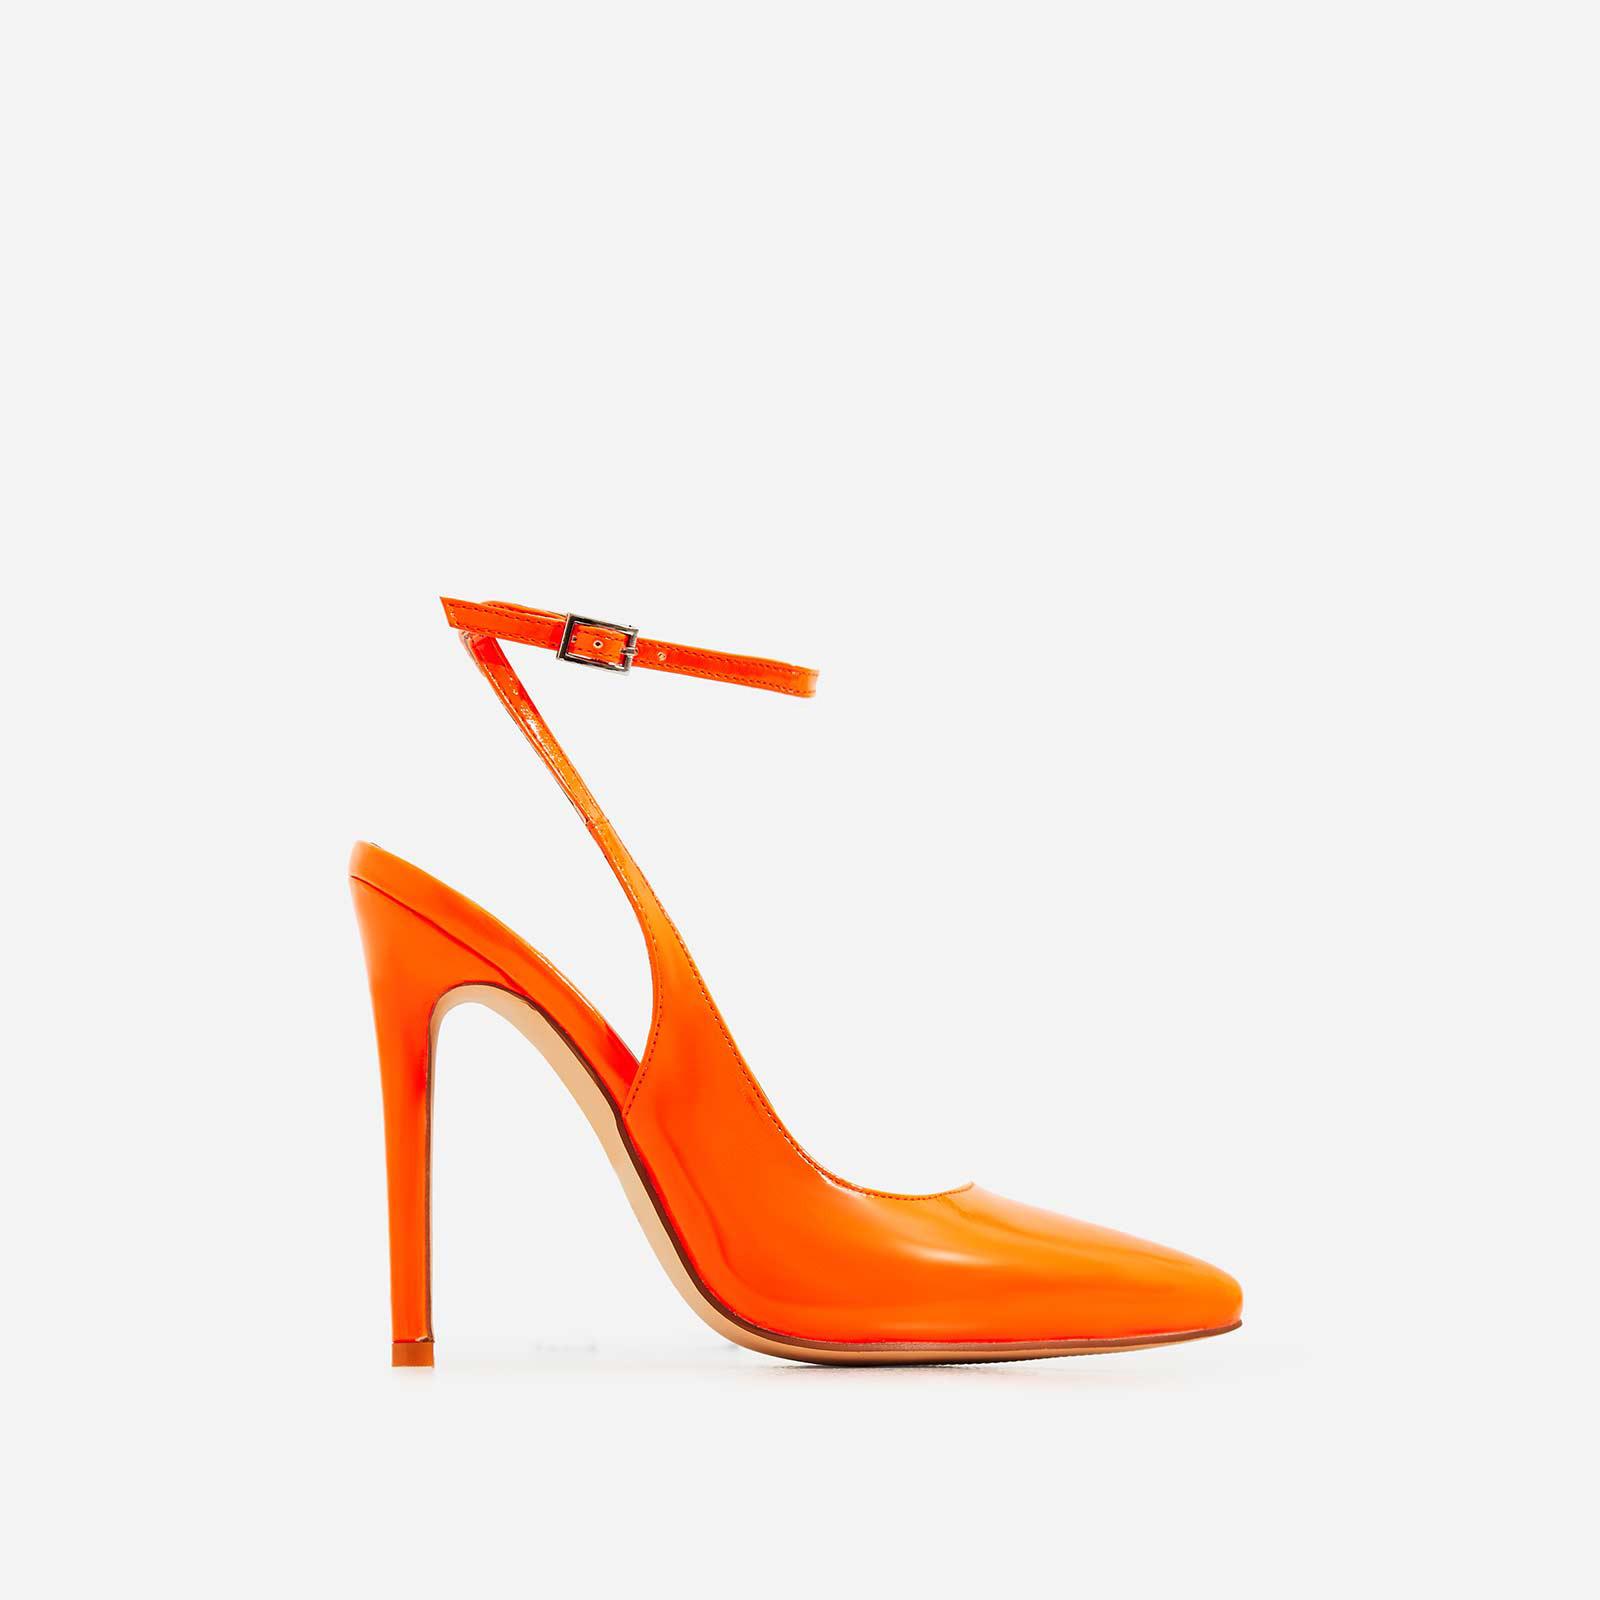 Raina Strappy Court Heel In Neon Orange Patent